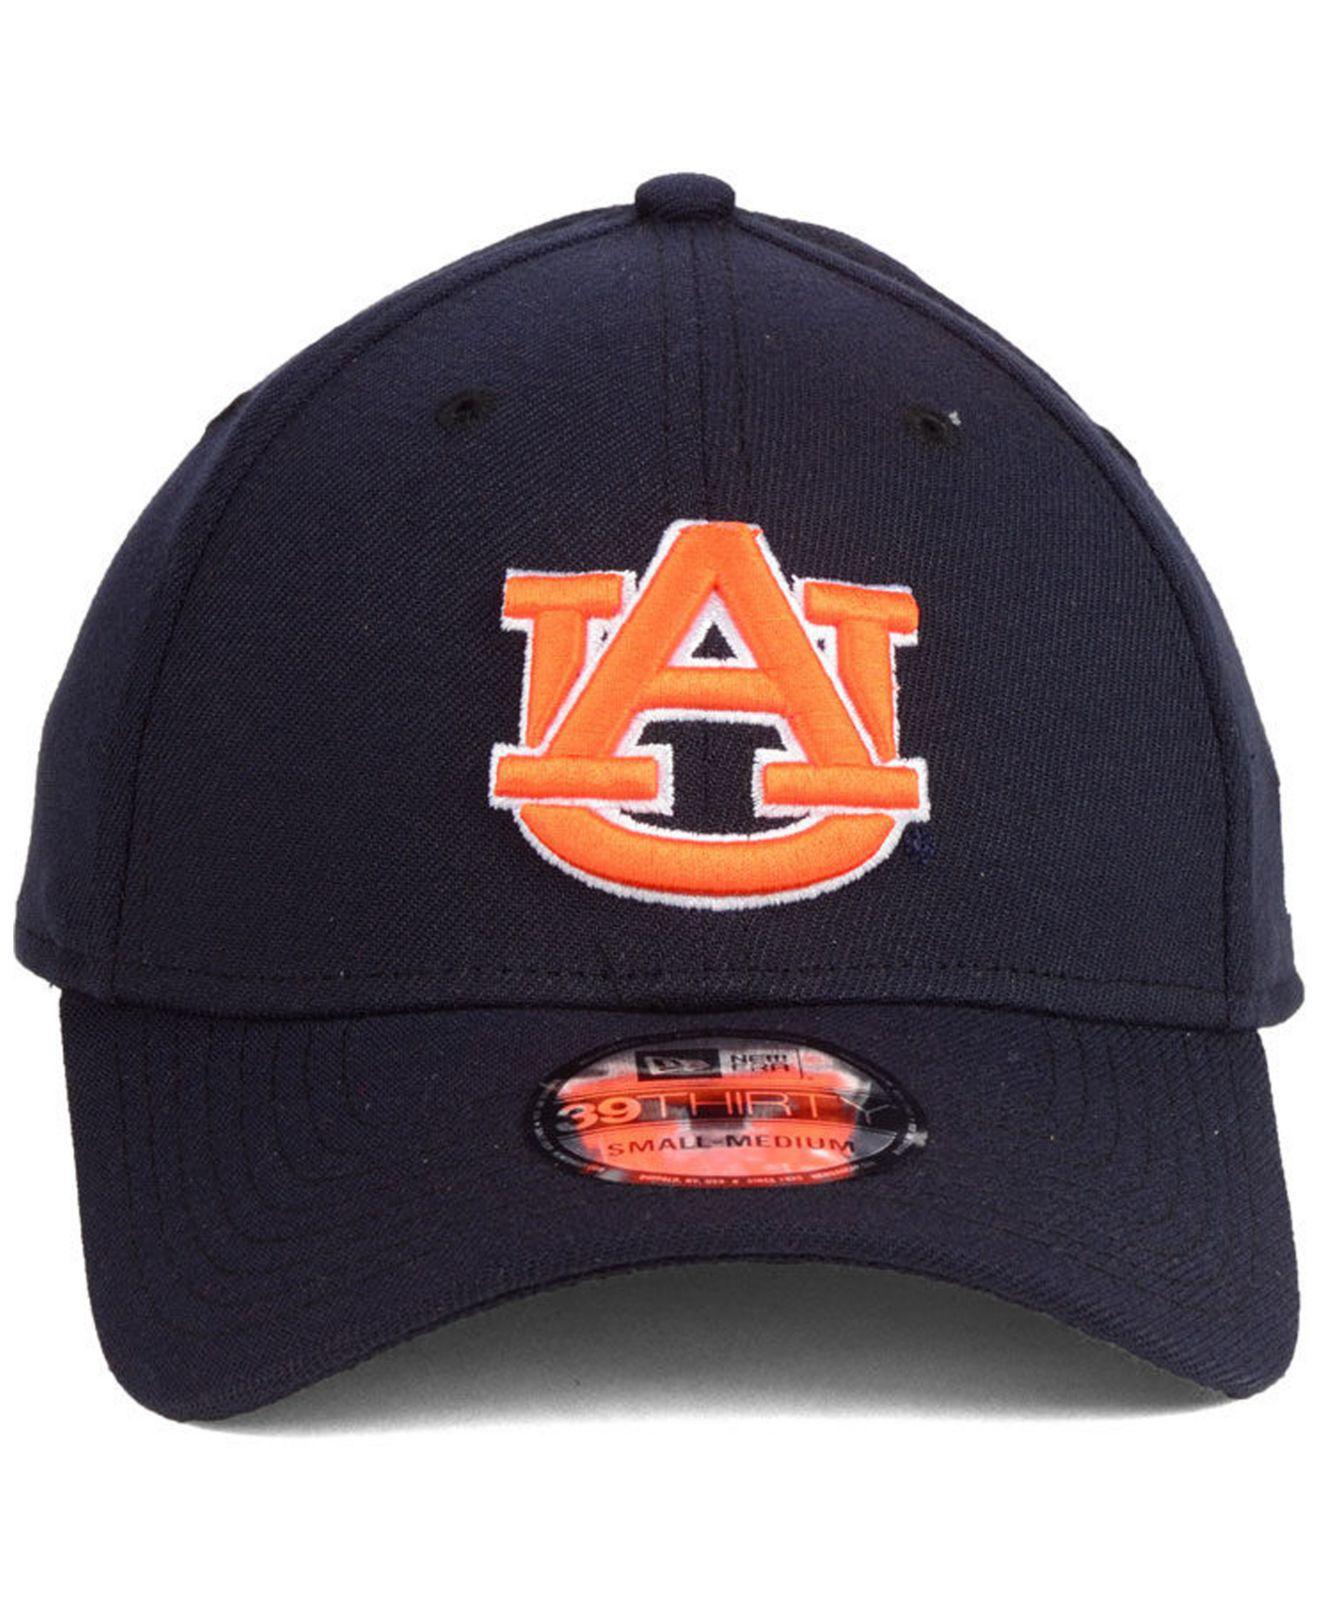 05e10f03416 Lyst - Ktz Auburn Tigers College Classic 39thirty Cap in Blue for Men